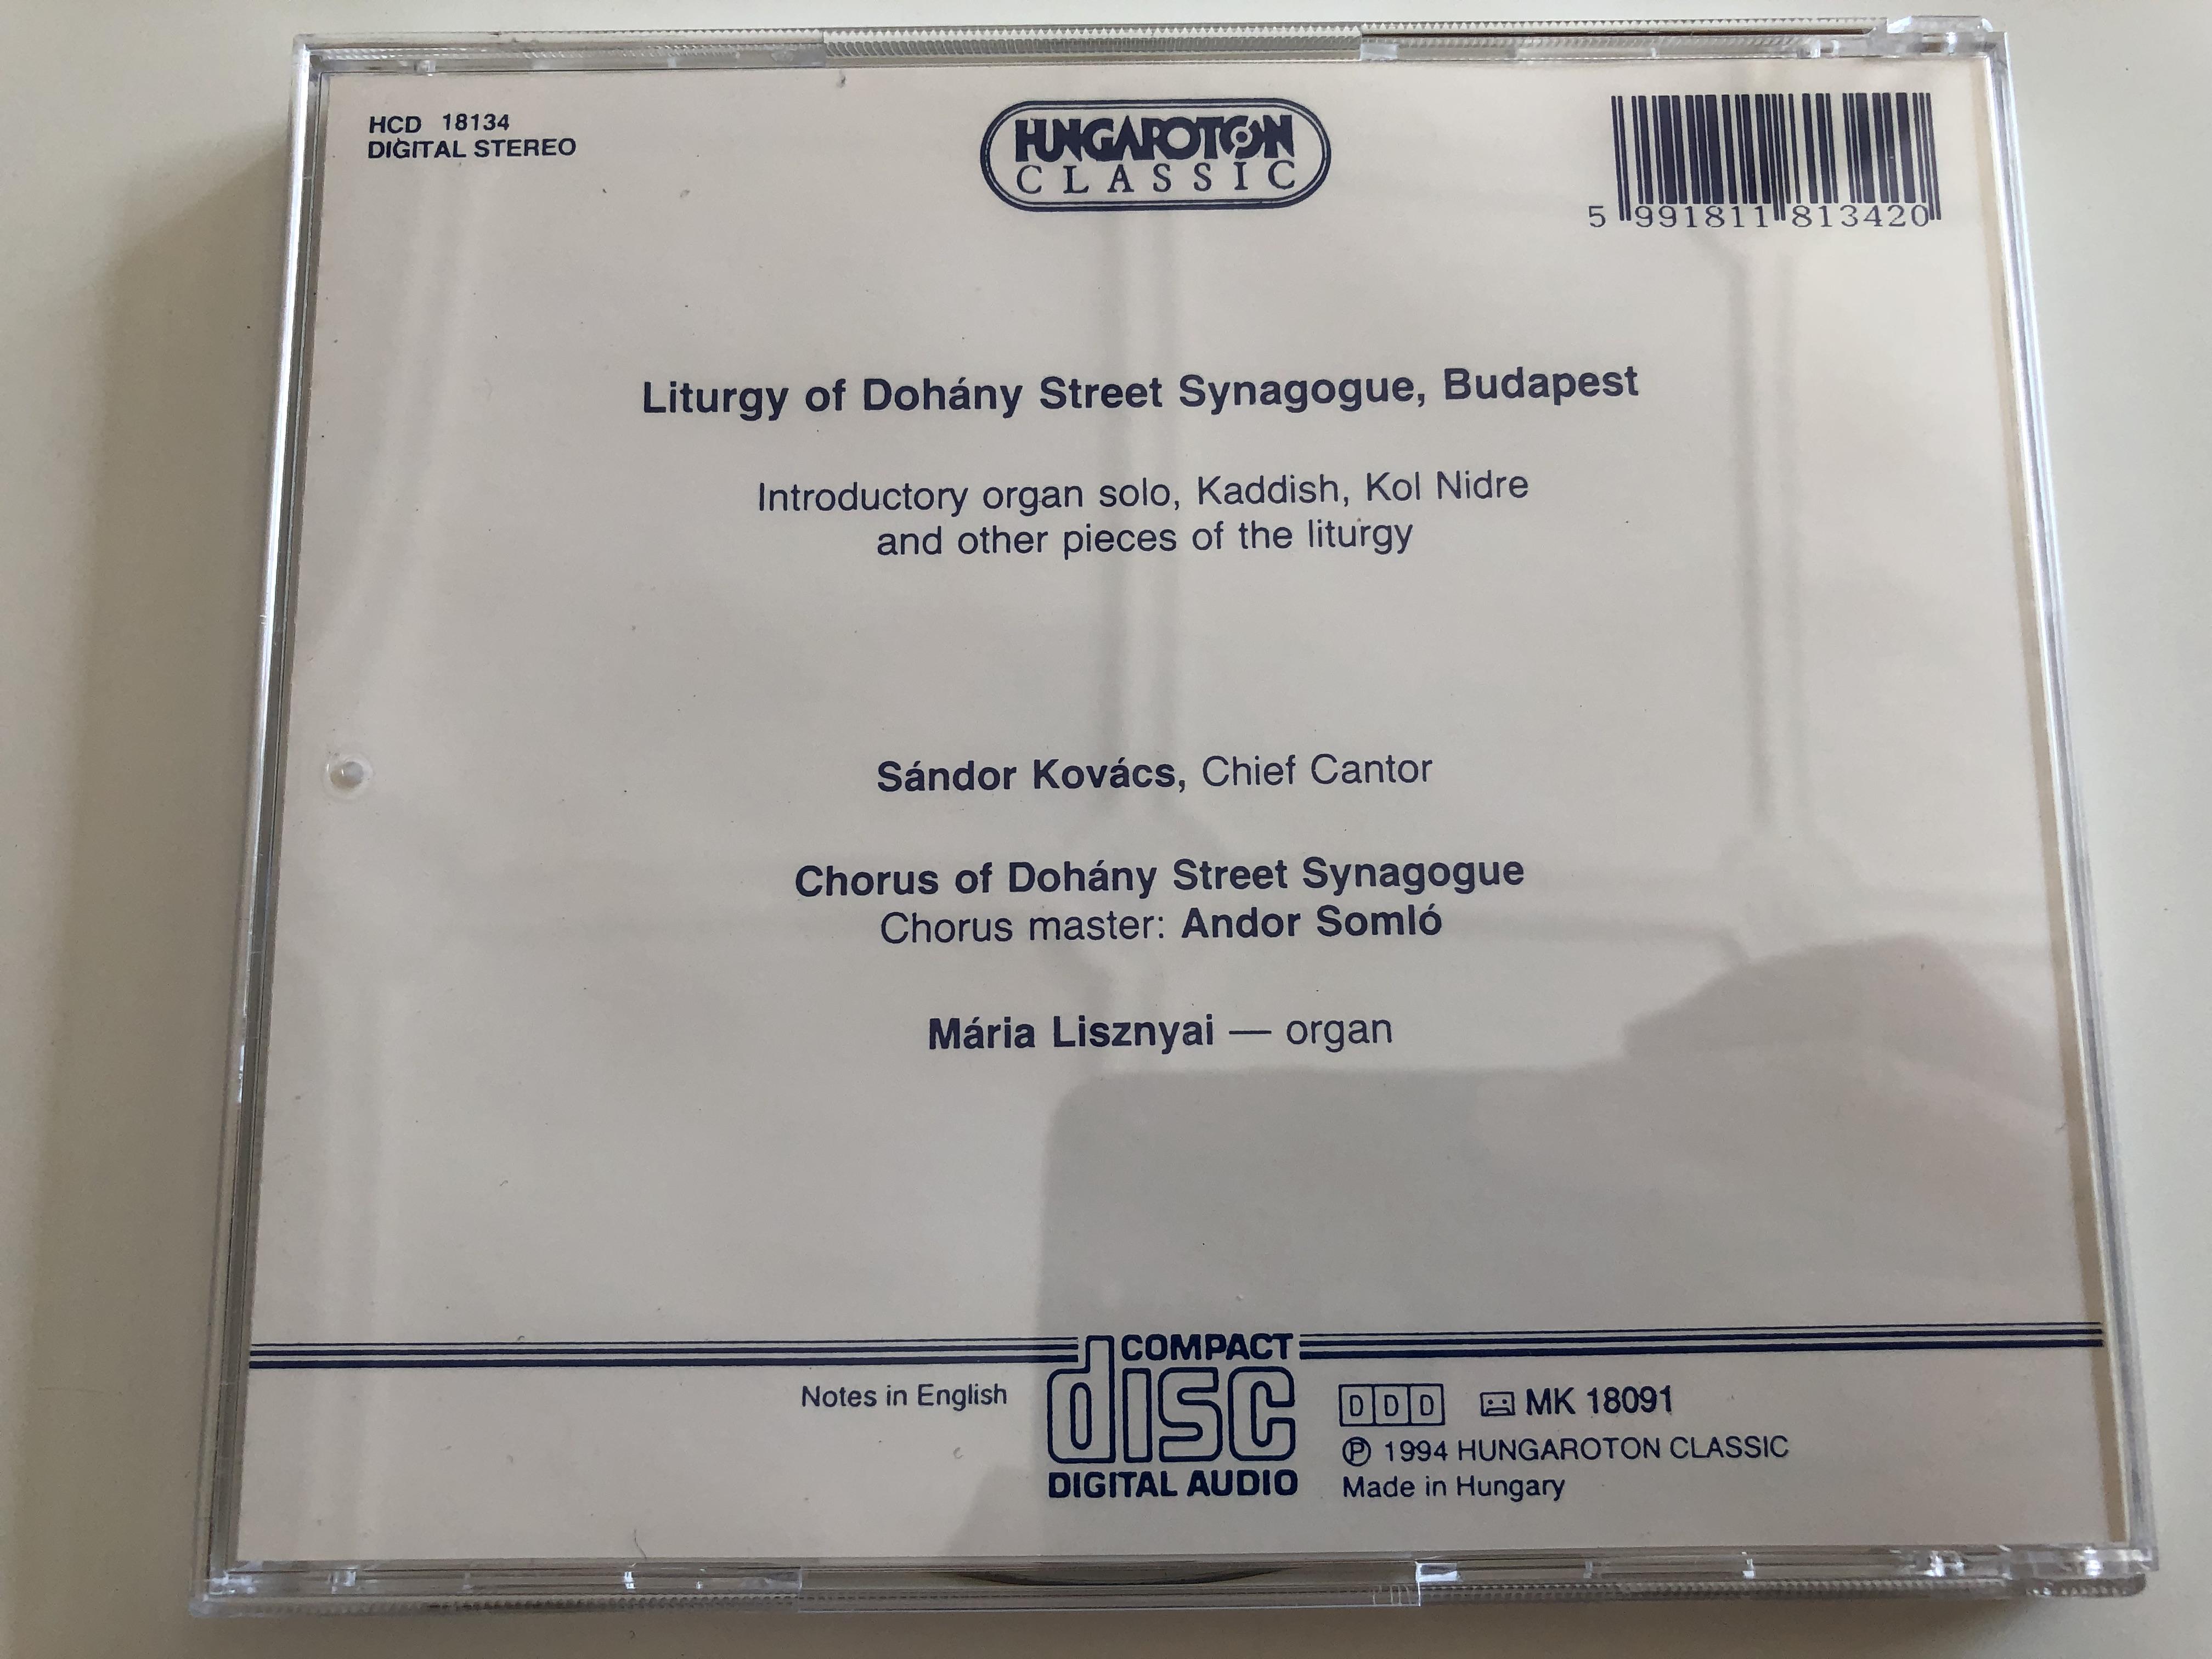 liturgy-of-doh-ny-street-synagogue-s-ndor-kov-cs-chief-cantor-hungaroton-classic-audio-cd-1994-hcd-18134-7-.jpg